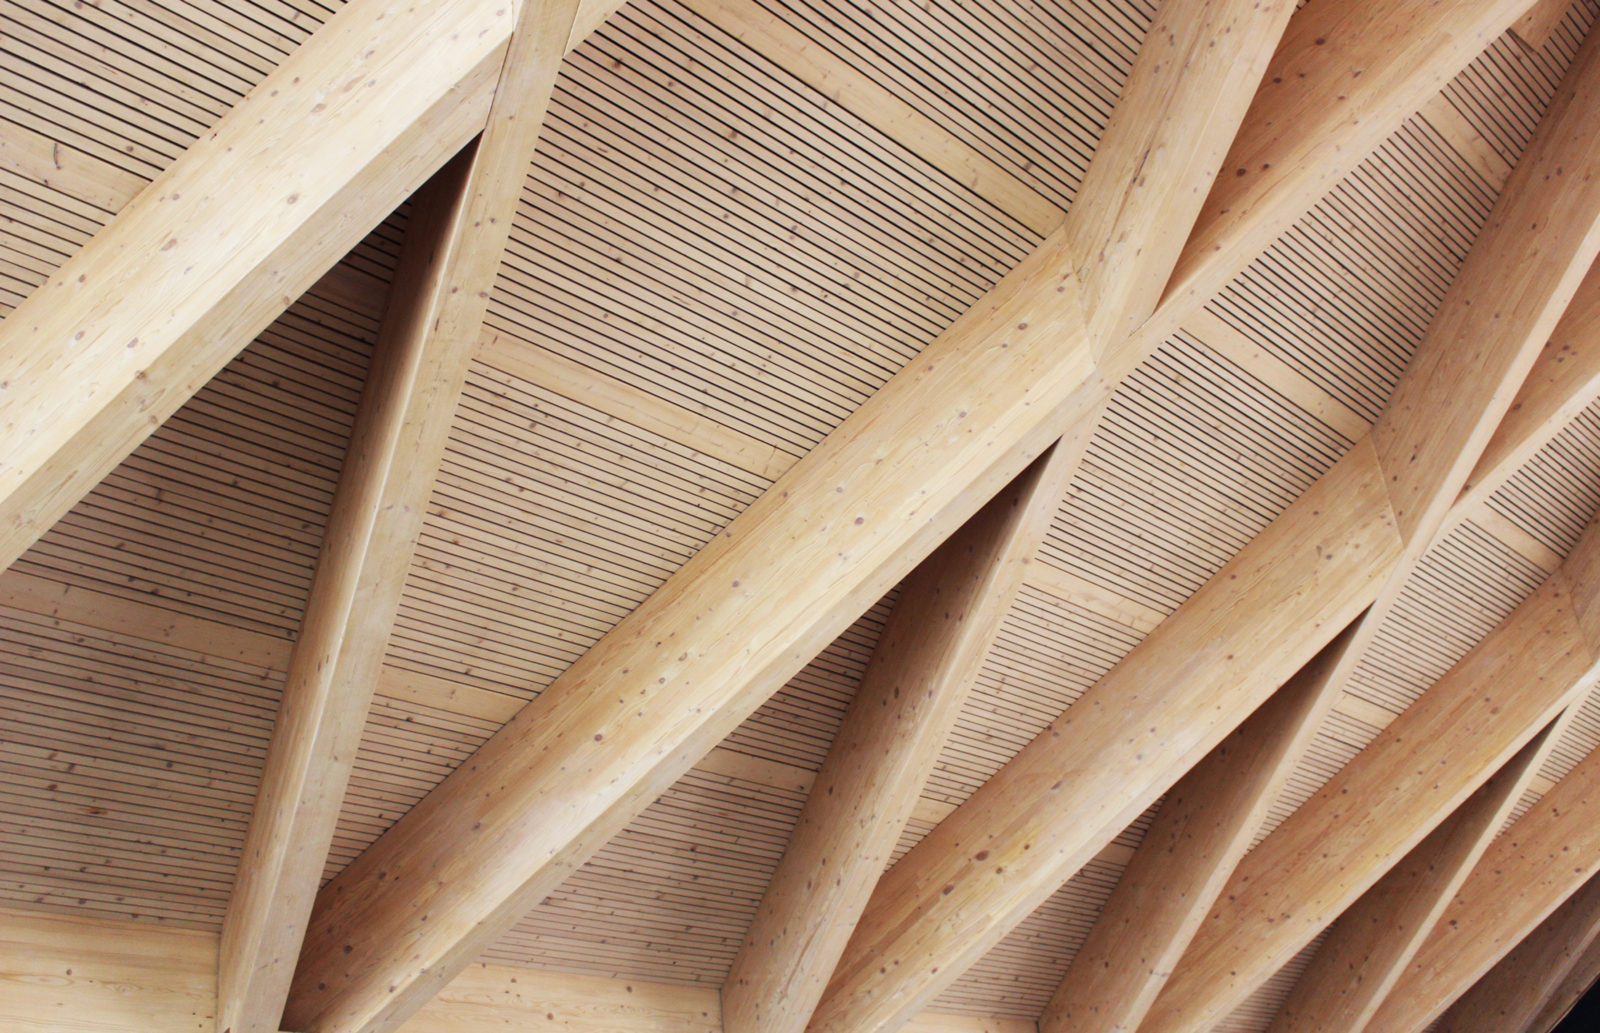 KjellanderSjöberg Restaurang-Magnolia  Foto 03 3600x2324px